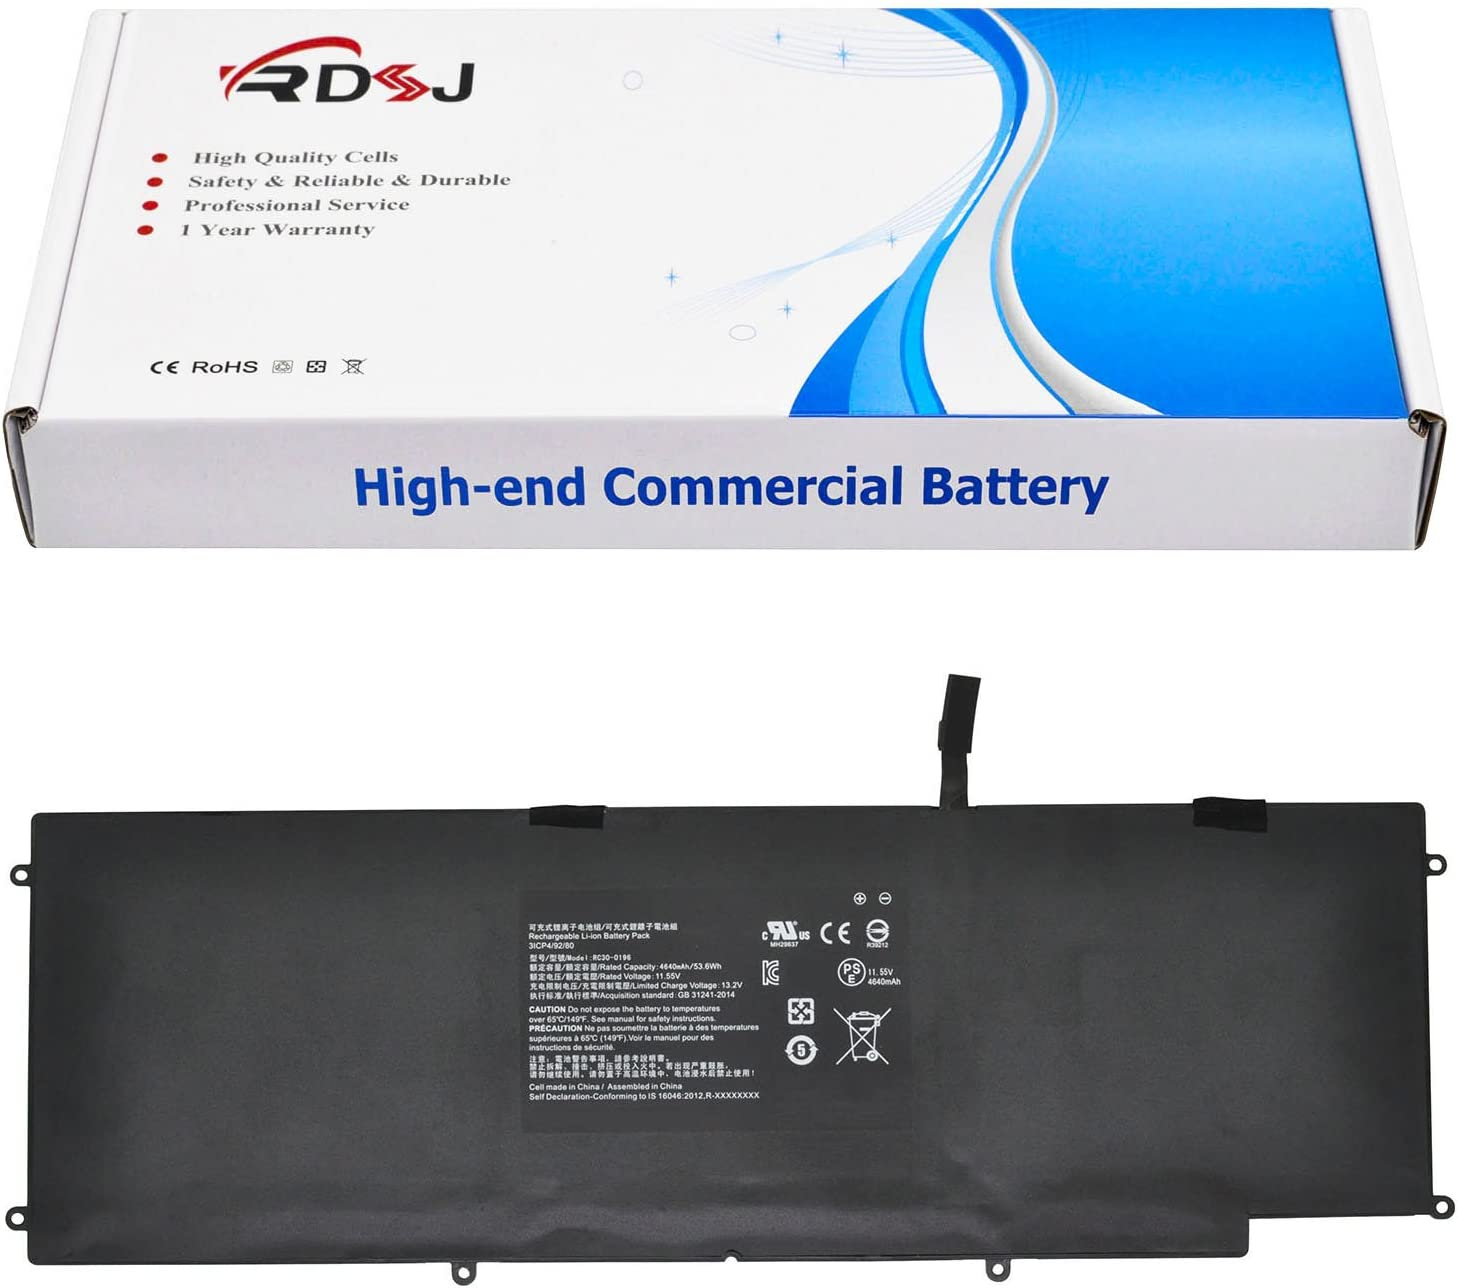 RC30-0196 Laptop Battery Compatible Razer Blade Stealth 2016 v2 i7-7500U 3ICP4/92/80 RZ09-01962E52 RZ09-01962E53 RZ09-01962E20 RZ09-01962E10 RZ09-01962E12 RZ09-01962W10 11.55V 53.6Wh